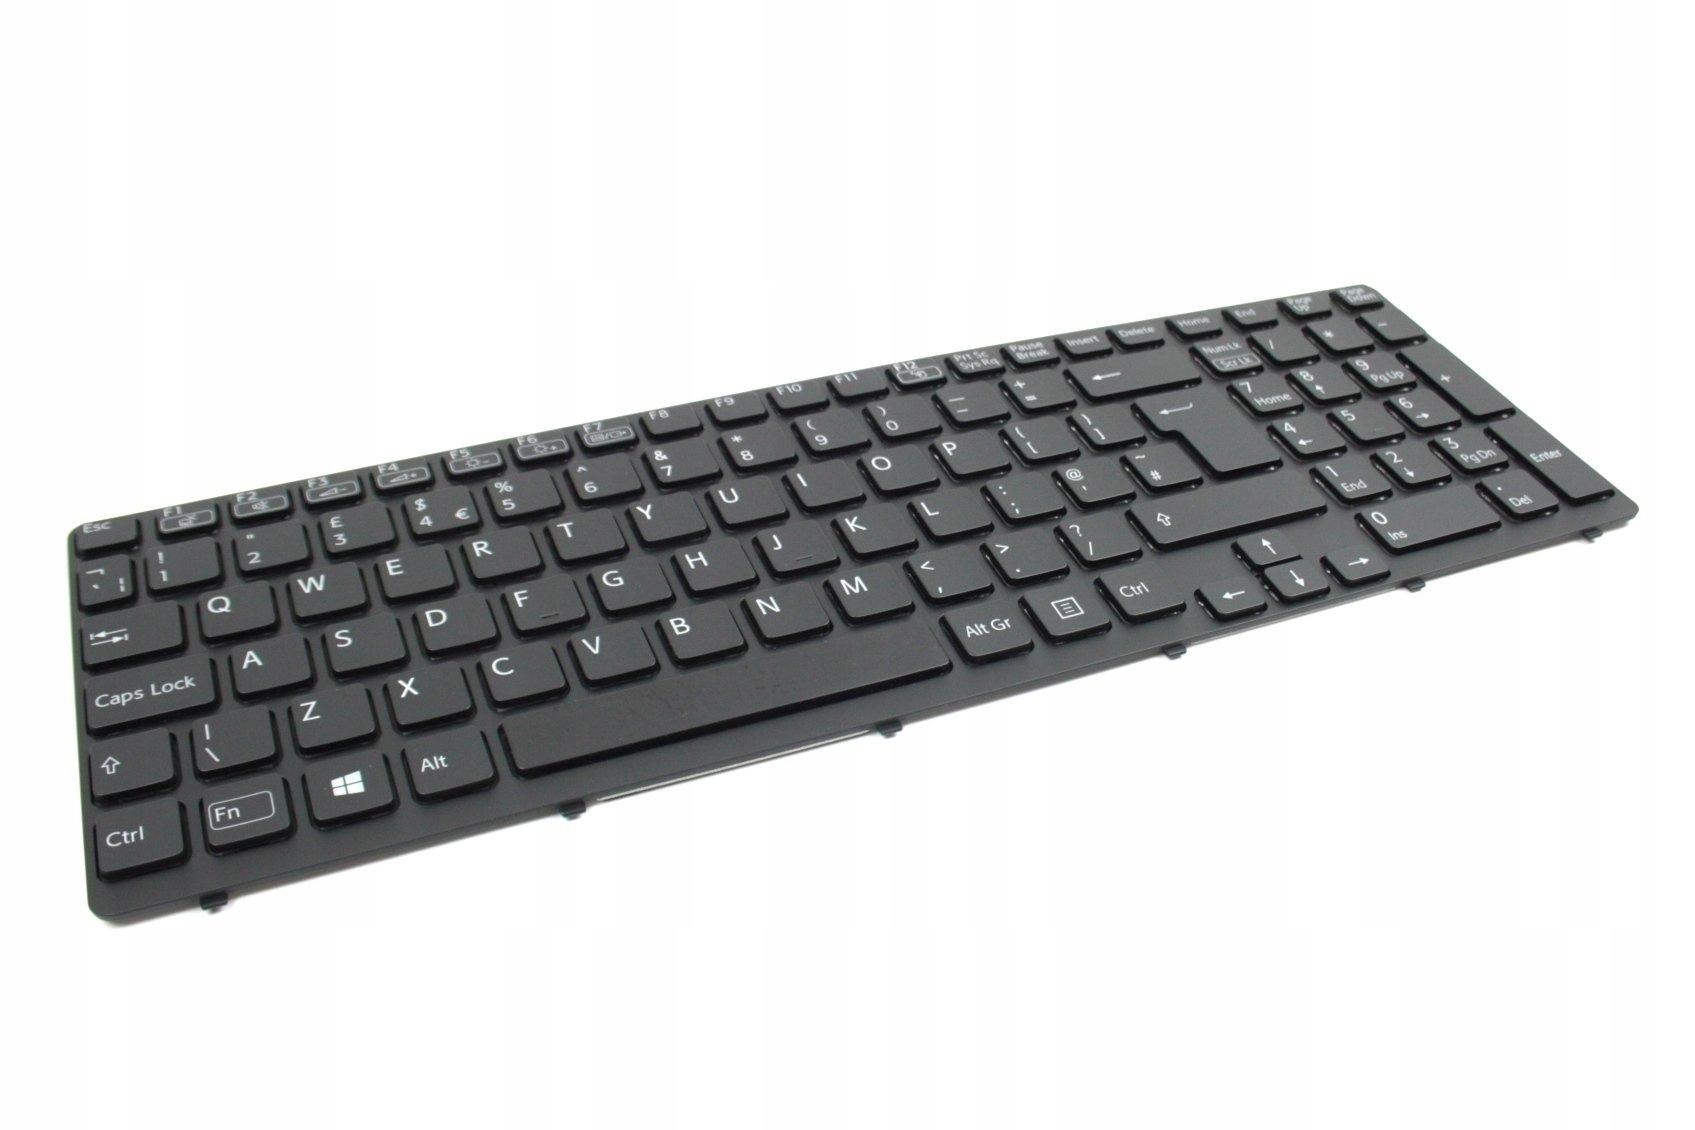 KLAWIATURA SONY VAIO SVE15 SVE1511C5E SVE151C11M - Klawiatury do laptopów